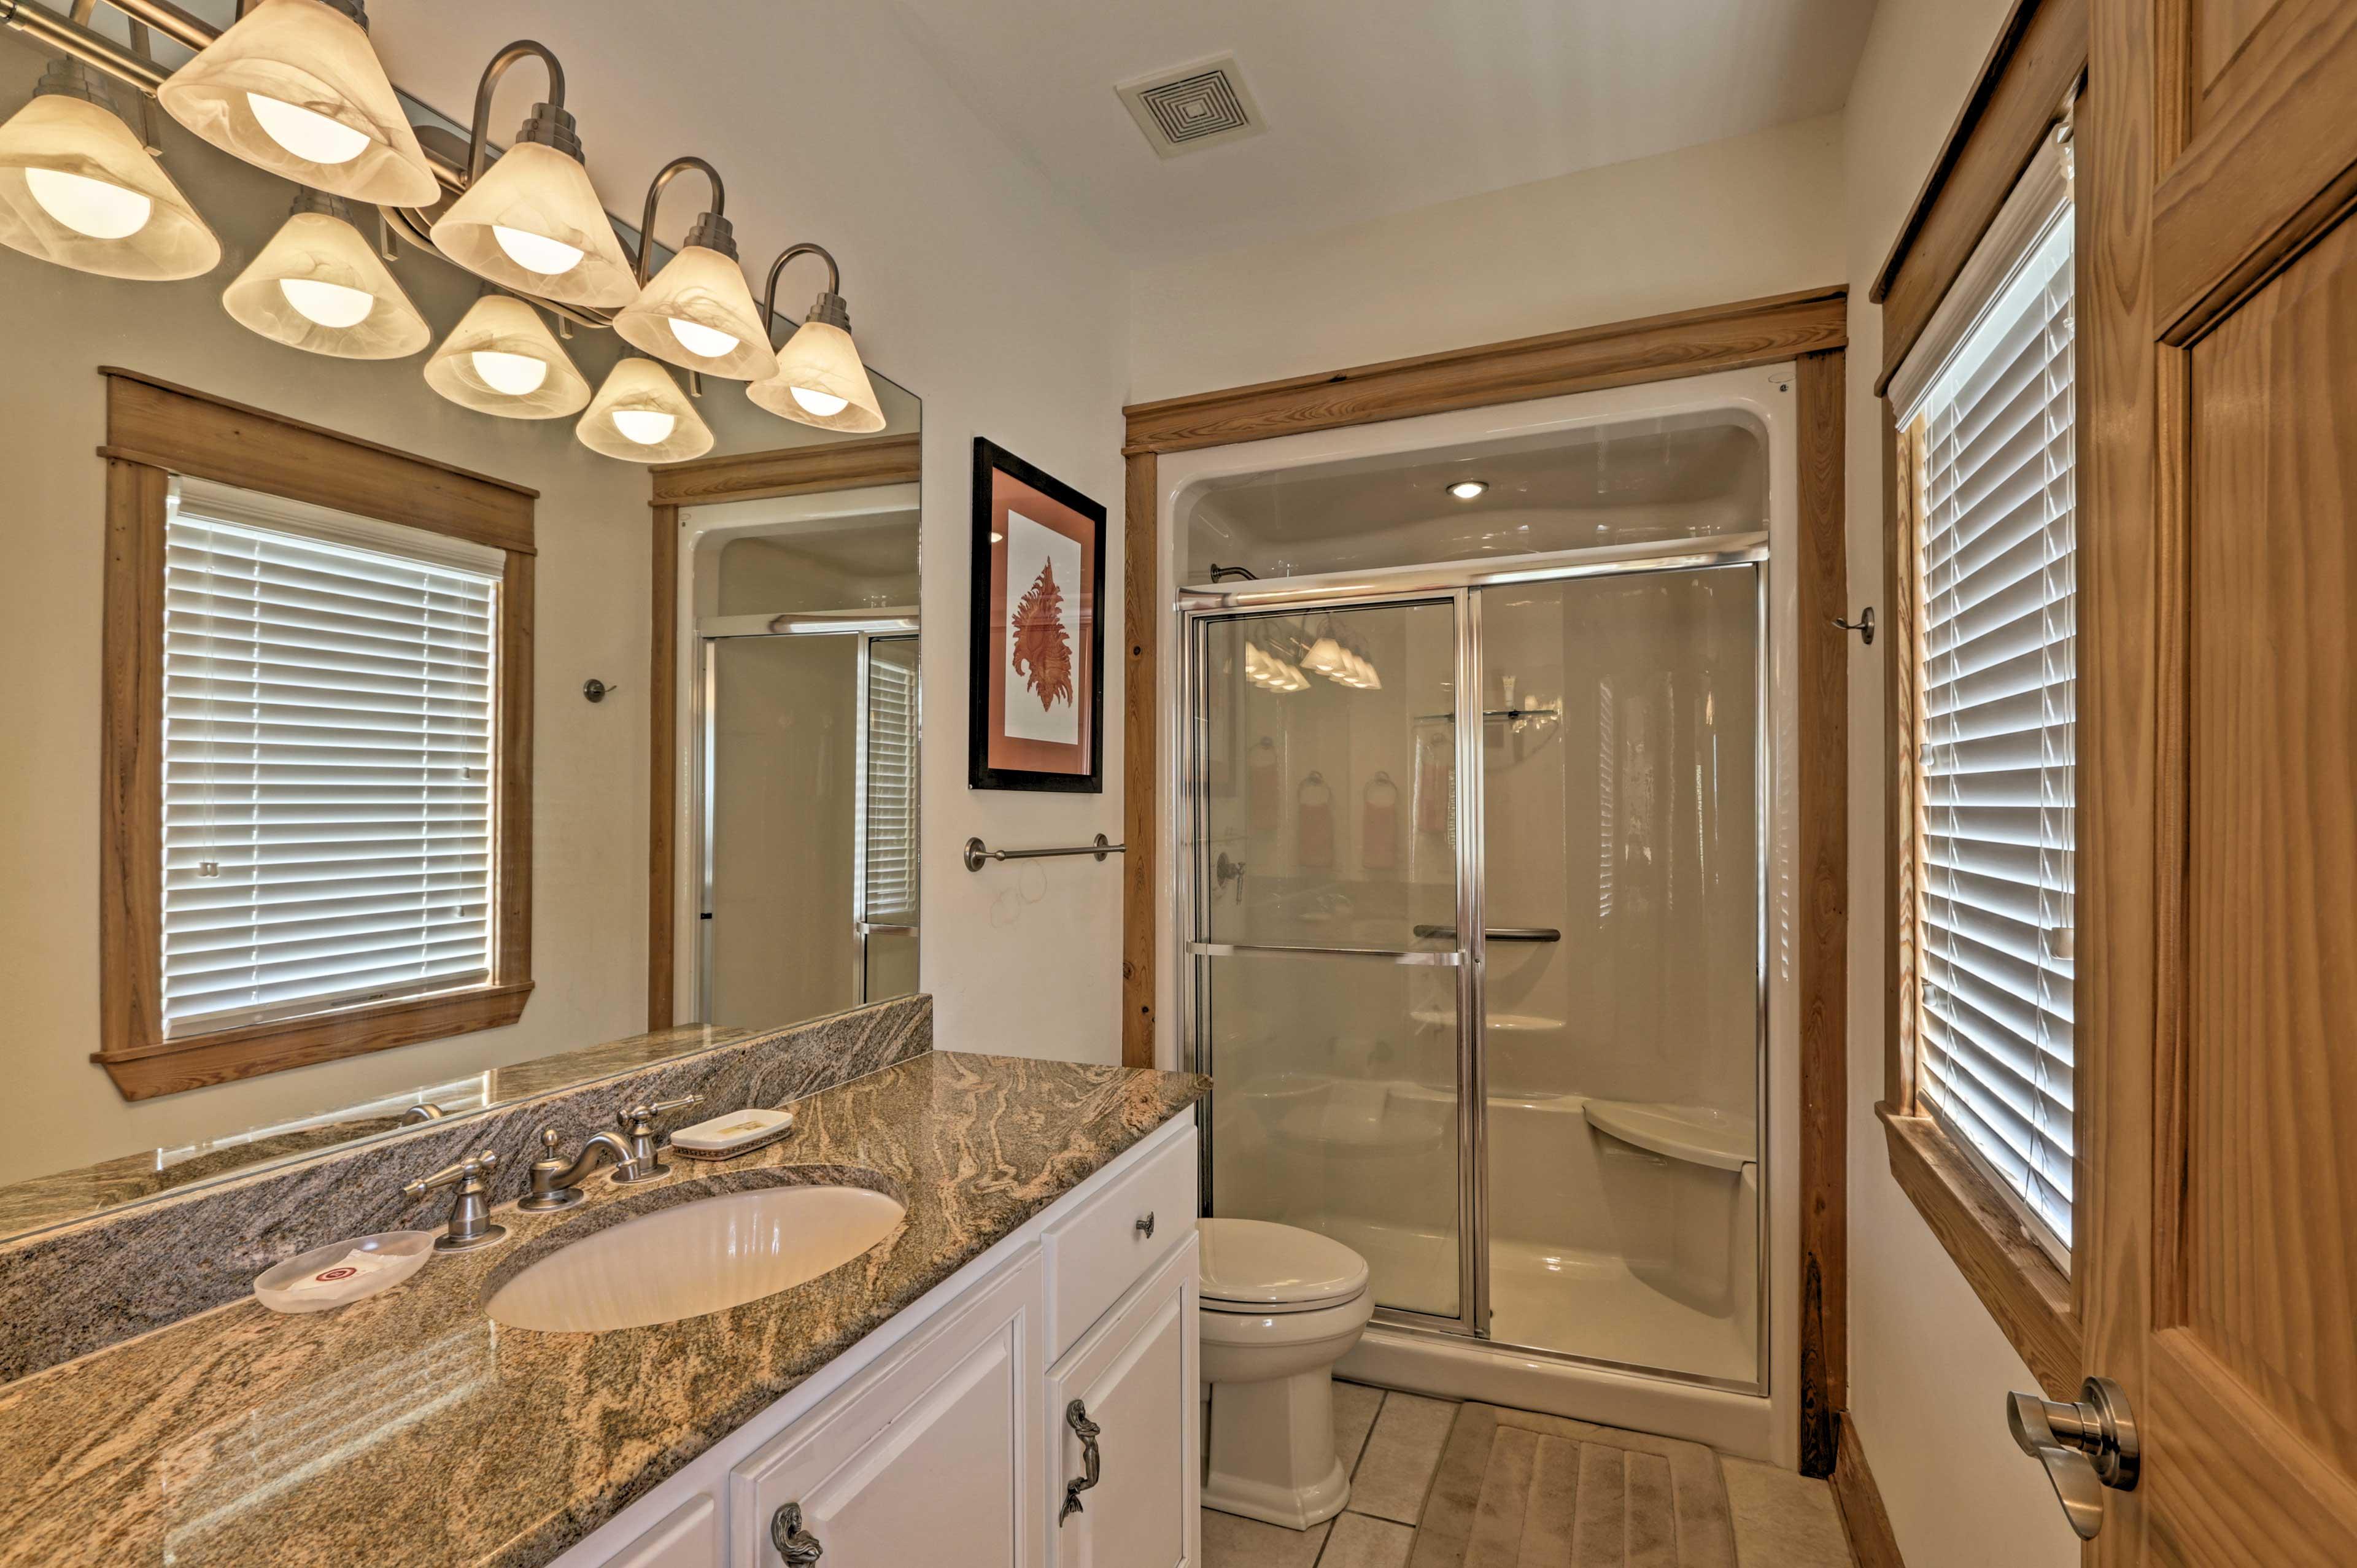 With a spacious walk-in shower, the second bedroom's en-suite bathroom is handicap accessible.